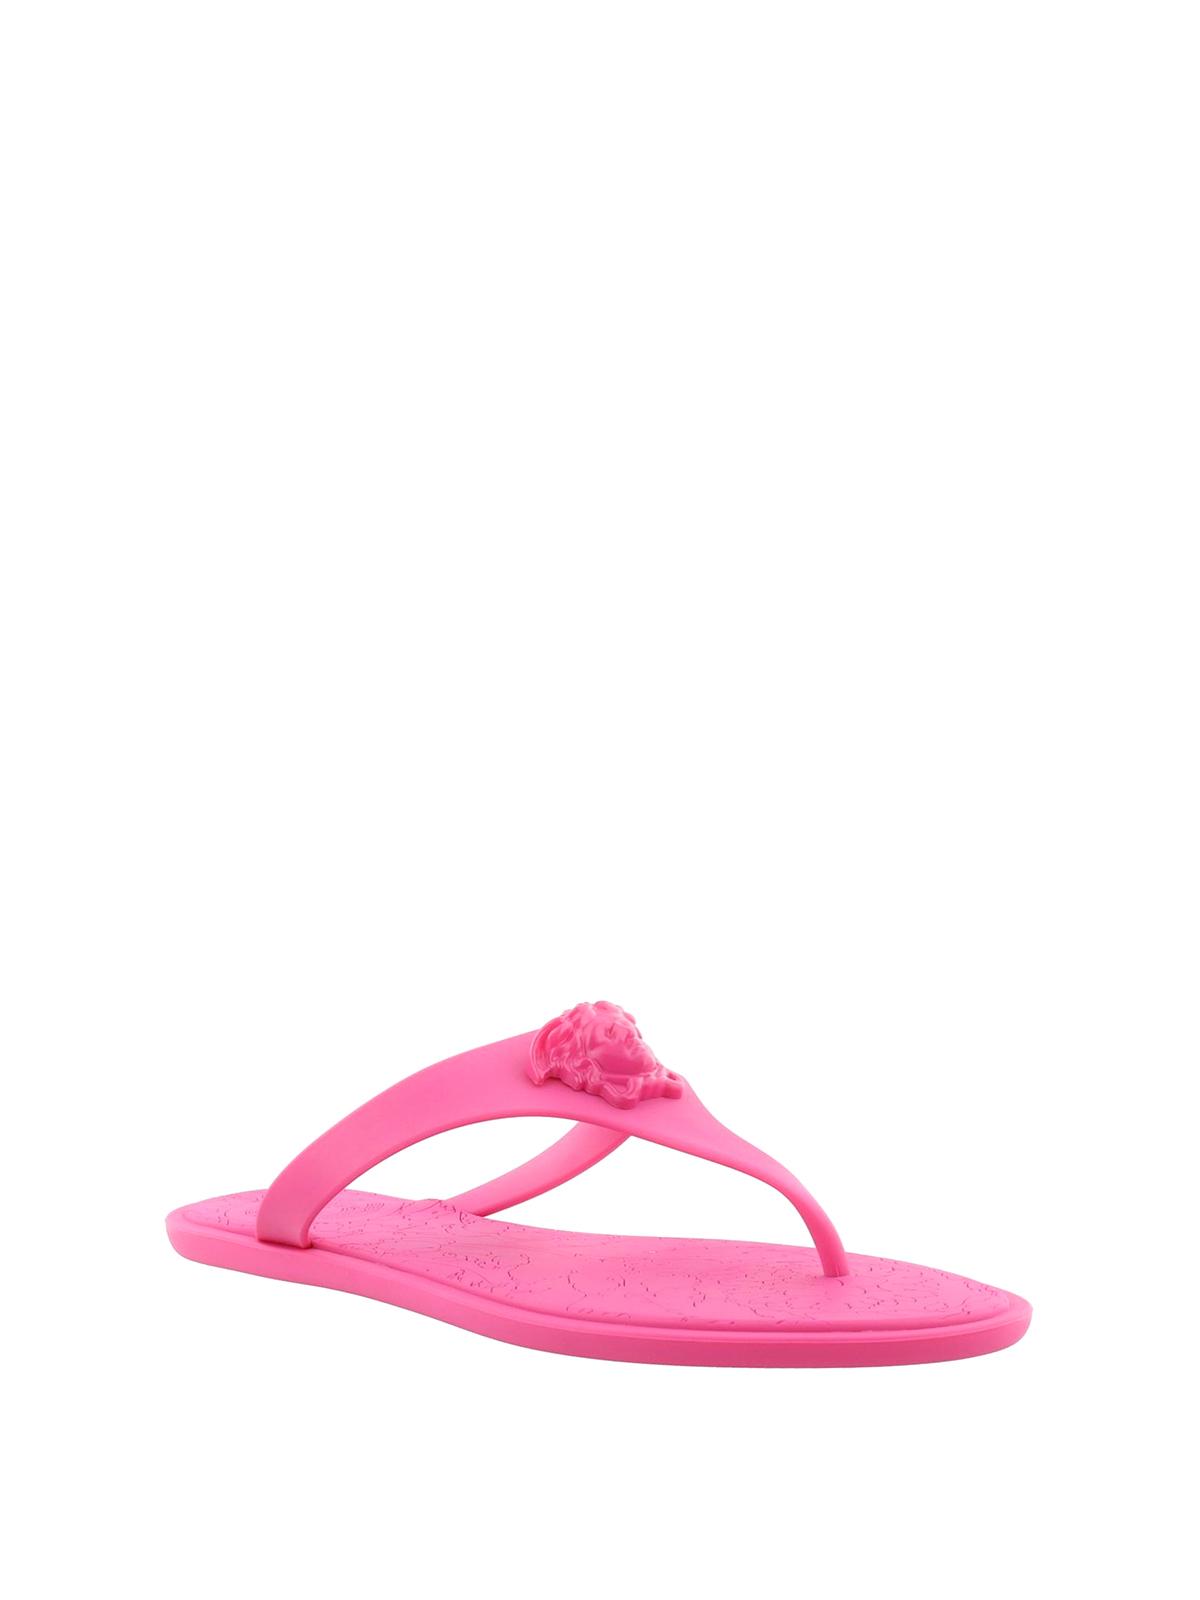 2a492b85851f8 Versace - Medusa Palazzo thong sandals - sandals - DSR257C DGOMS DZ9